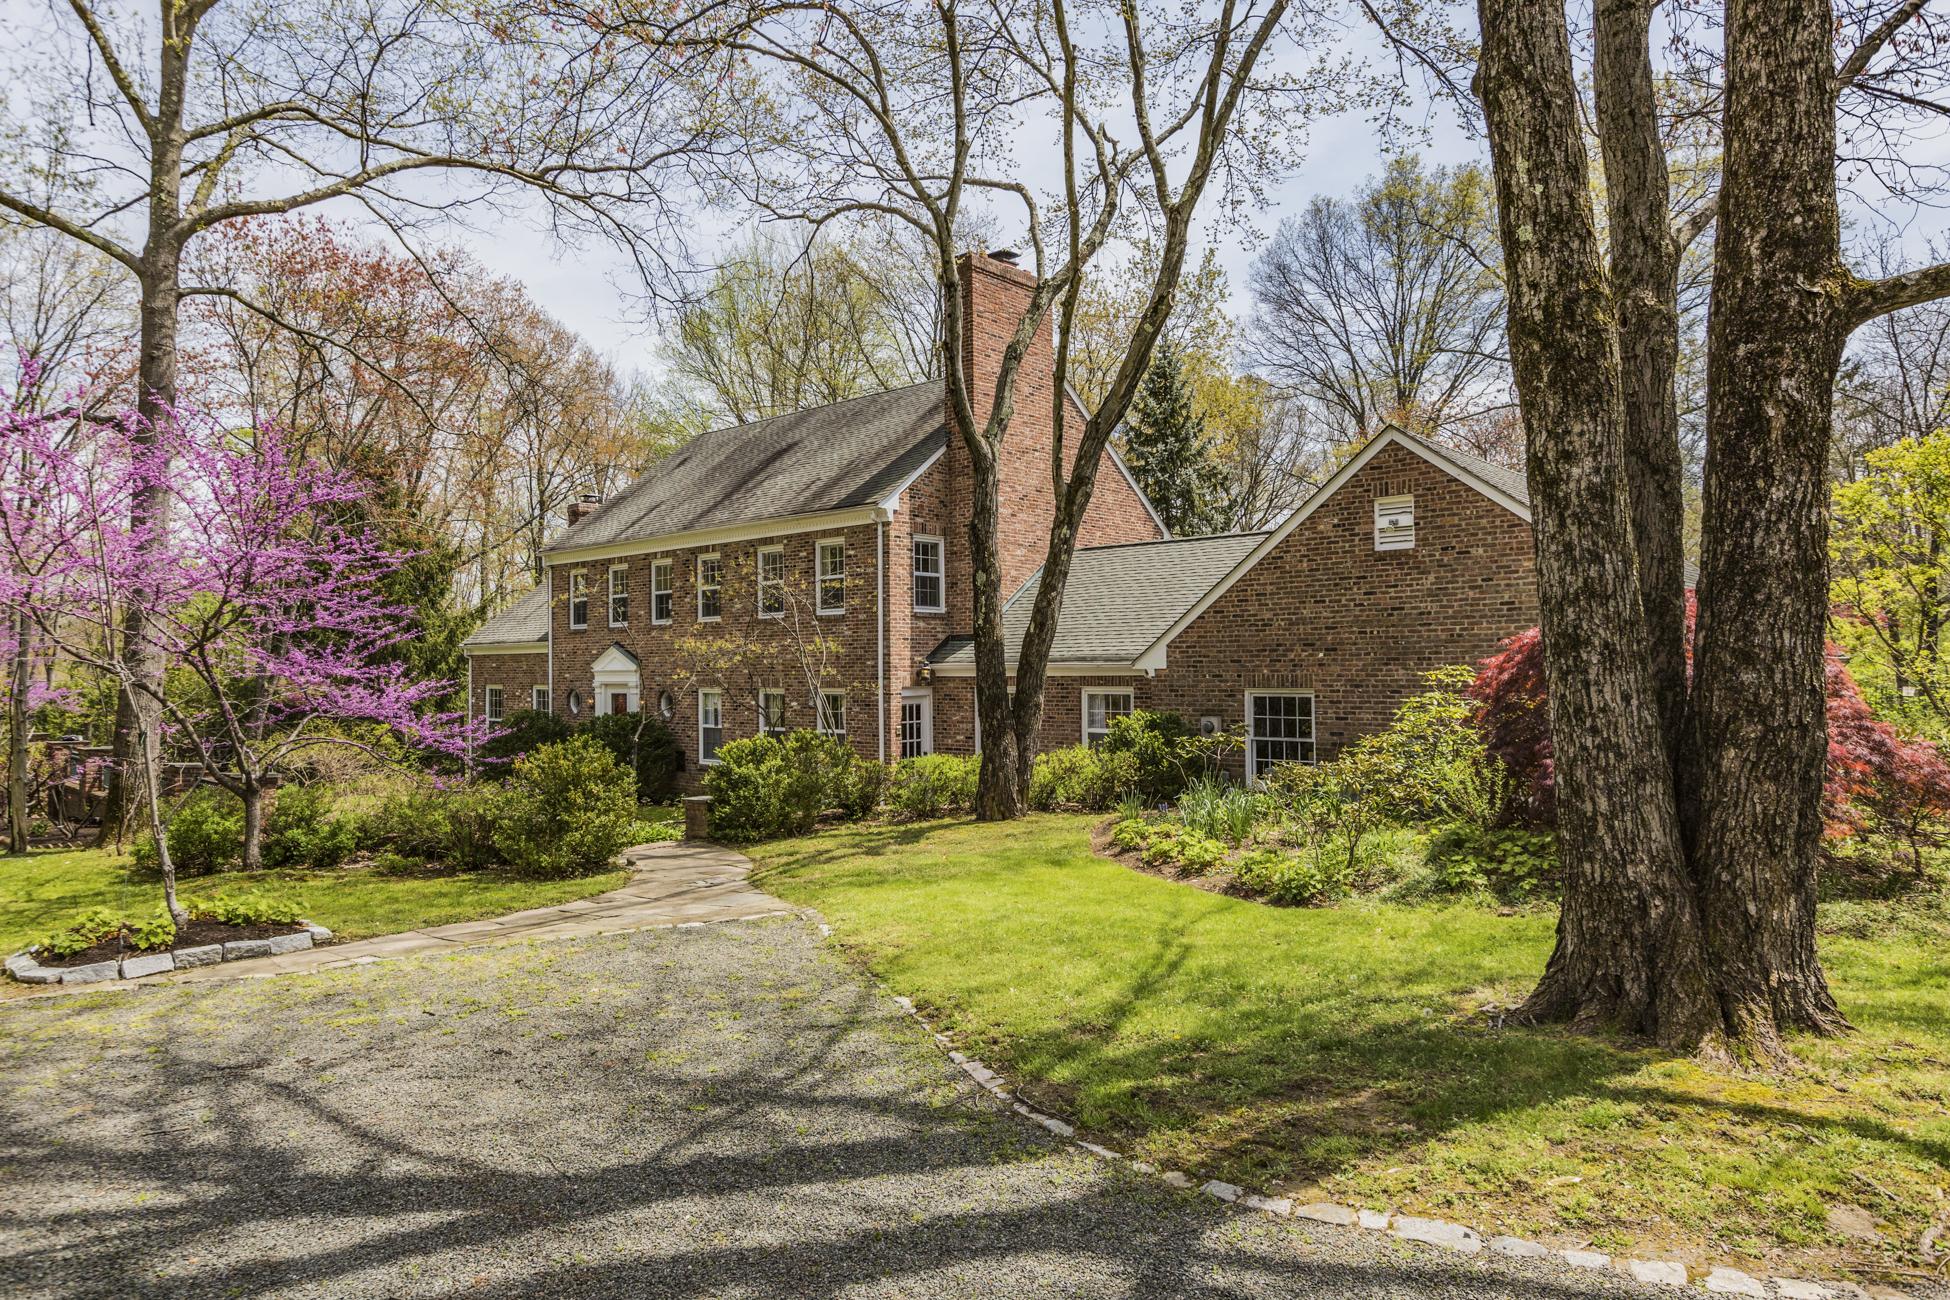 独户住宅 为 销售 在 Garden of Paradise, Nestled in a Princeton Enclave 33 Stuart Close 普林斯顿, 新泽西州, 08540 美国